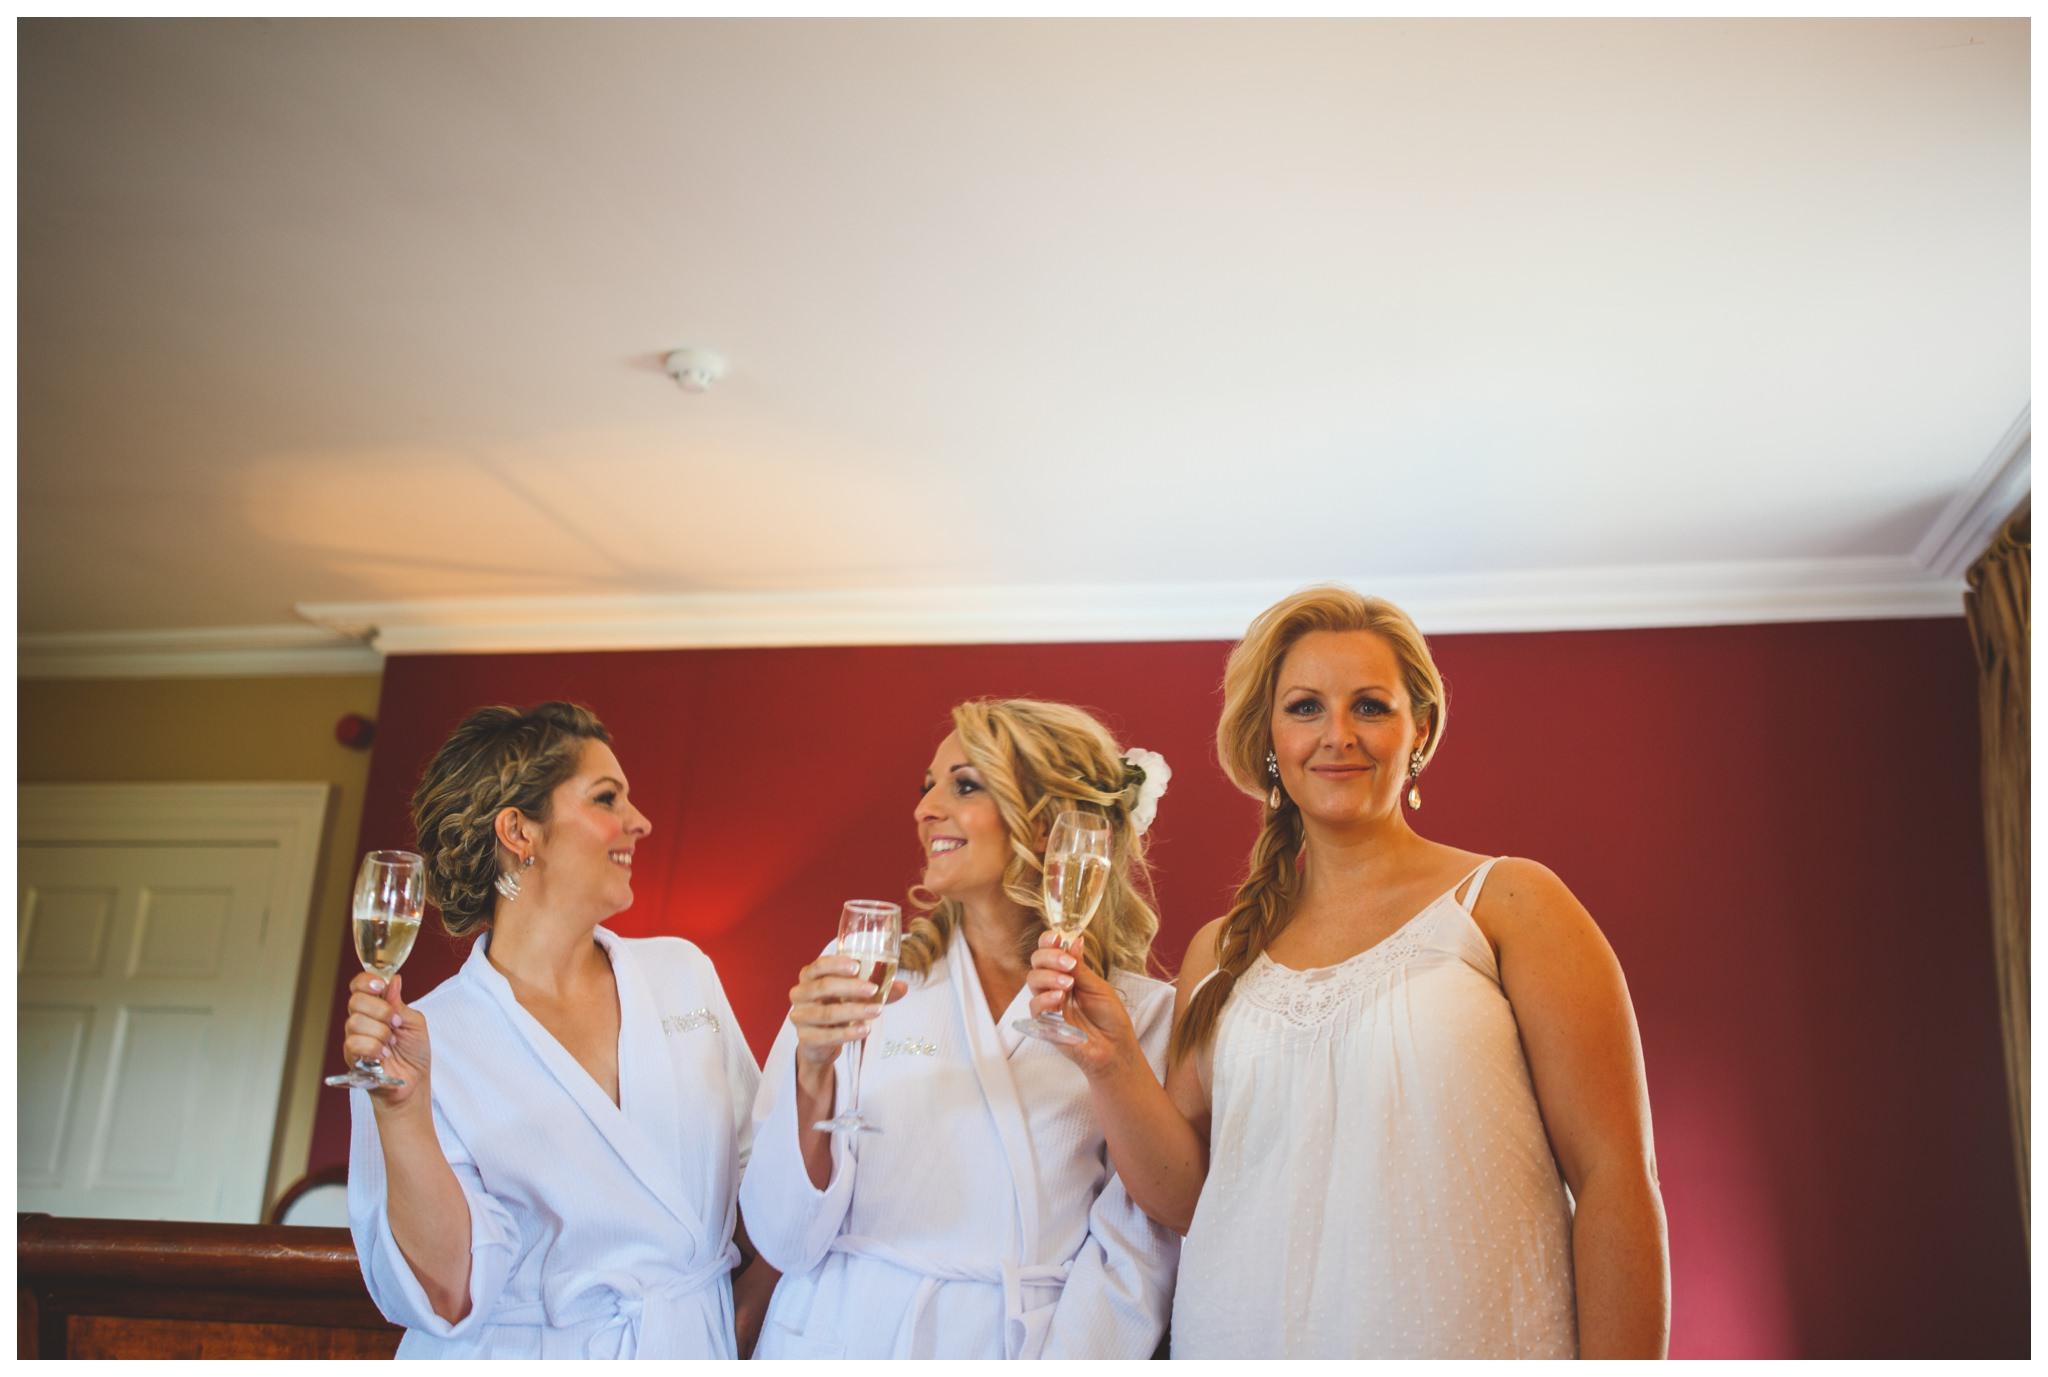 Richard Savage Photography - Wedding - Peterstone Court Brecon - 2016-05-11_0008